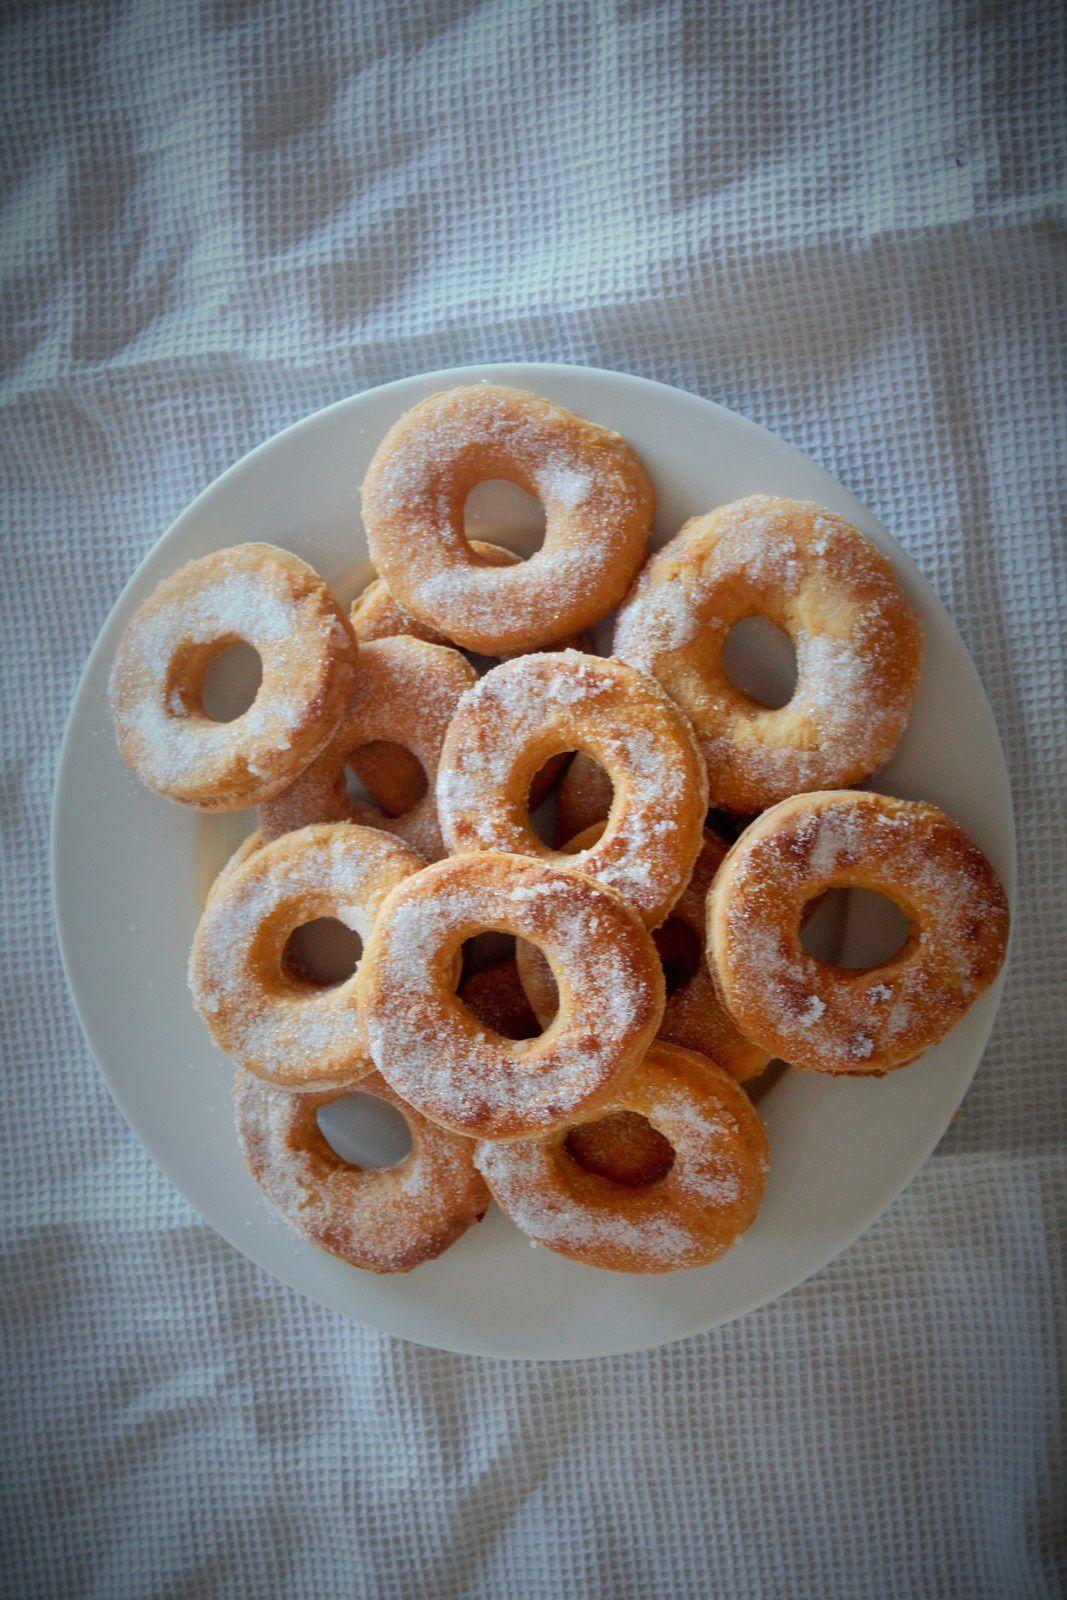 donuts de boniato (donuts de patate douce)